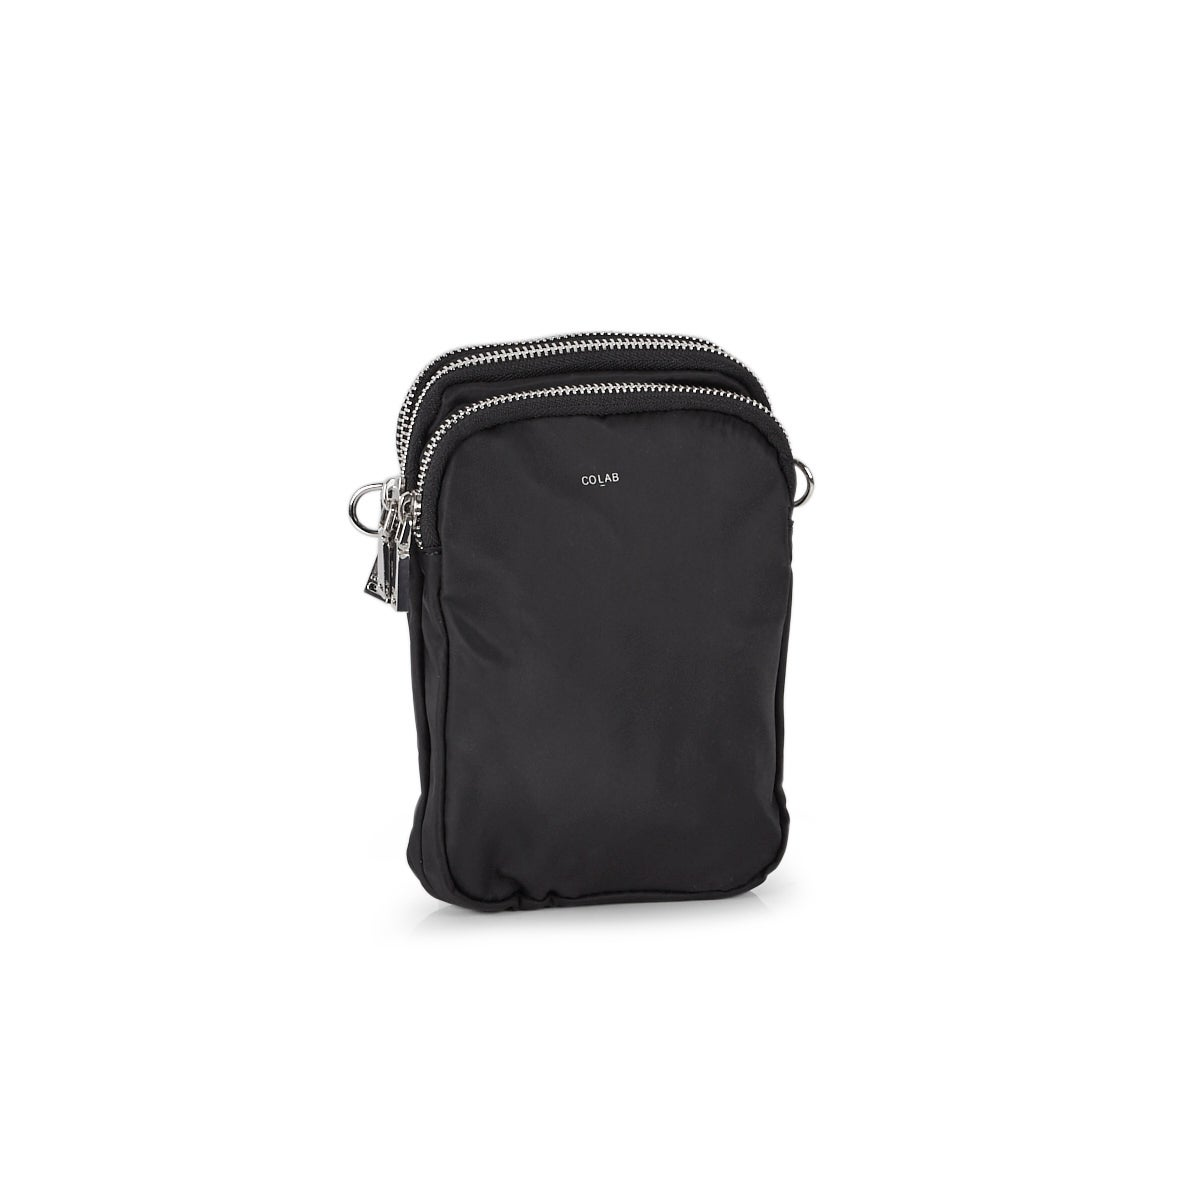 Women's 6360 black tech crossbody bag